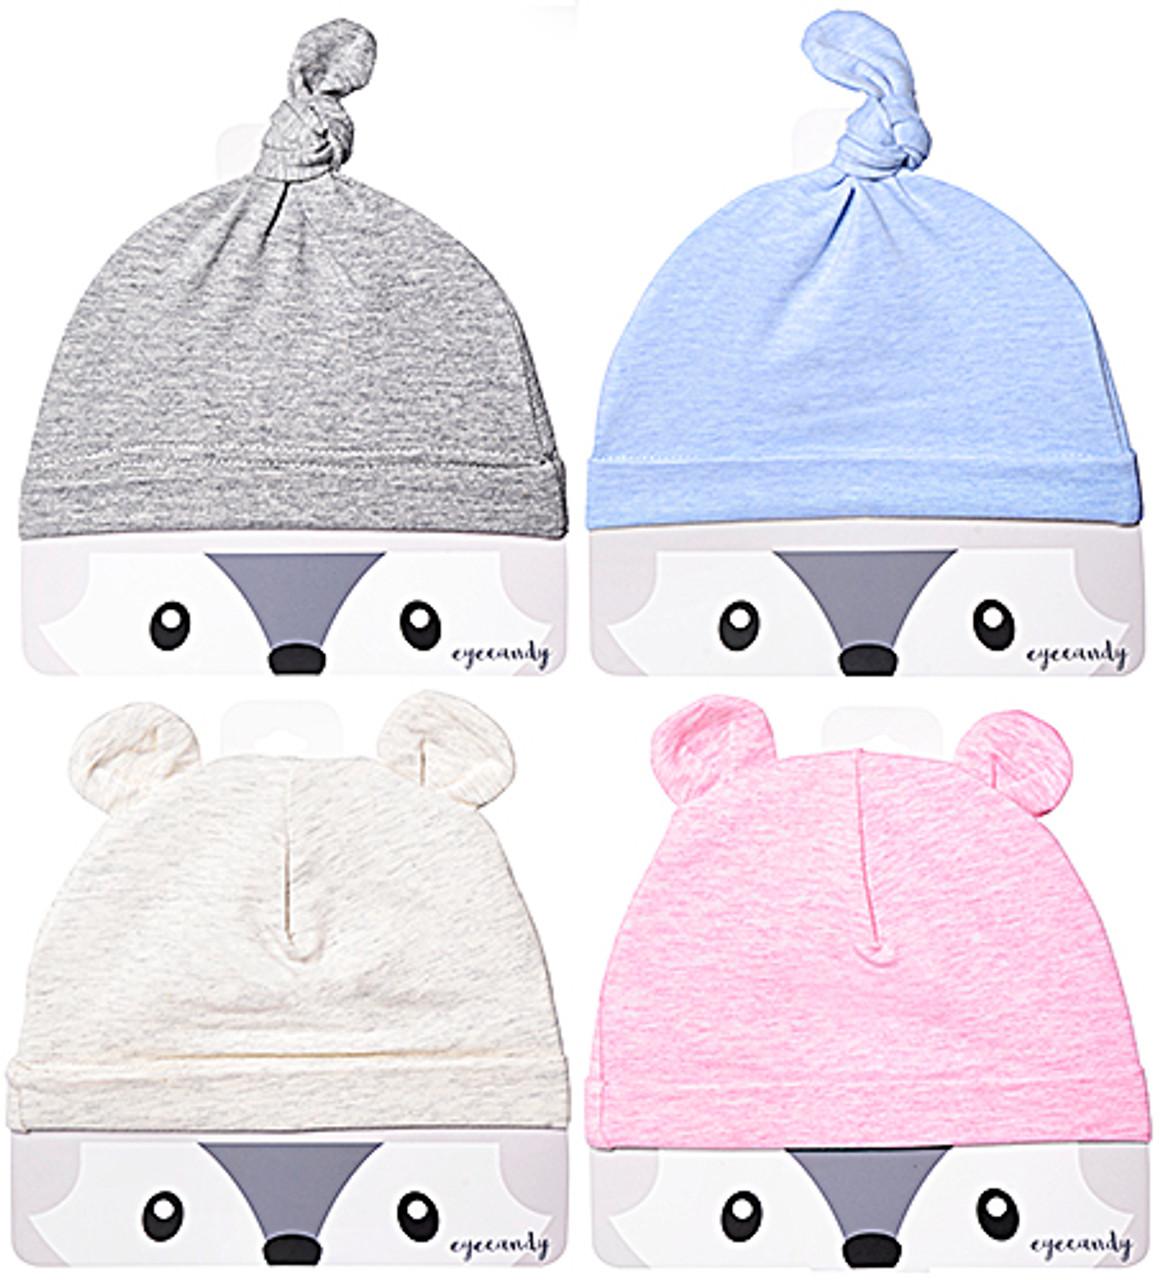 Eye Candy Baby Hat